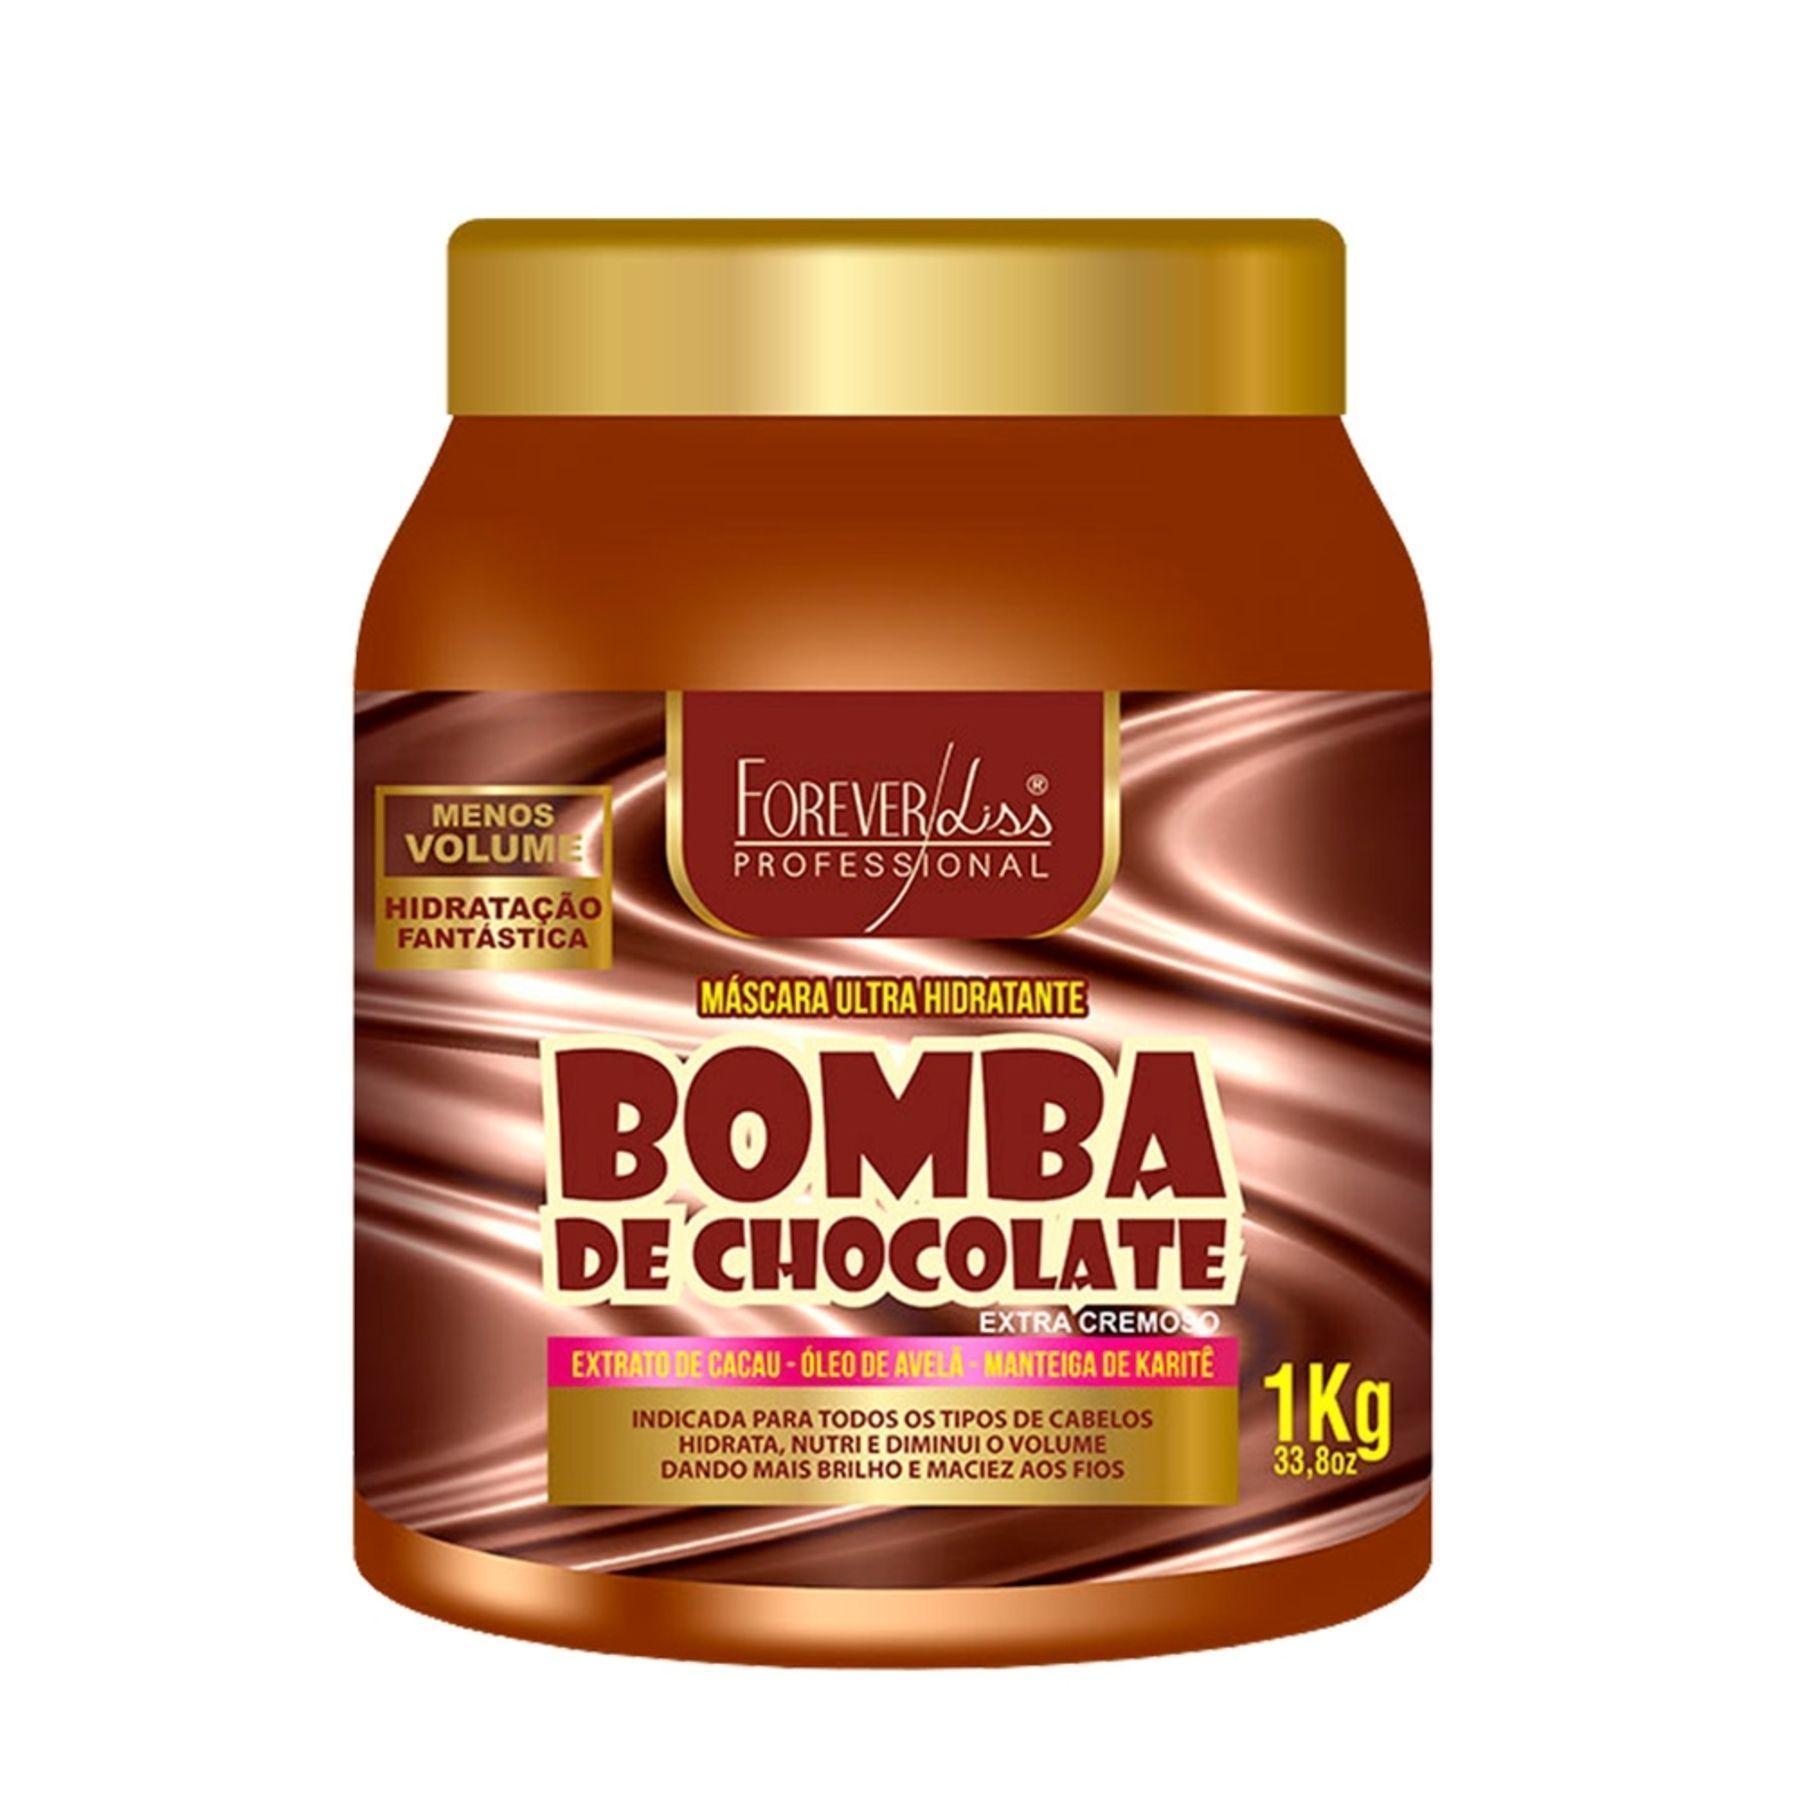 Máscara Ultra Hidratante Bomba De Chocolate Forever Liss 1kg